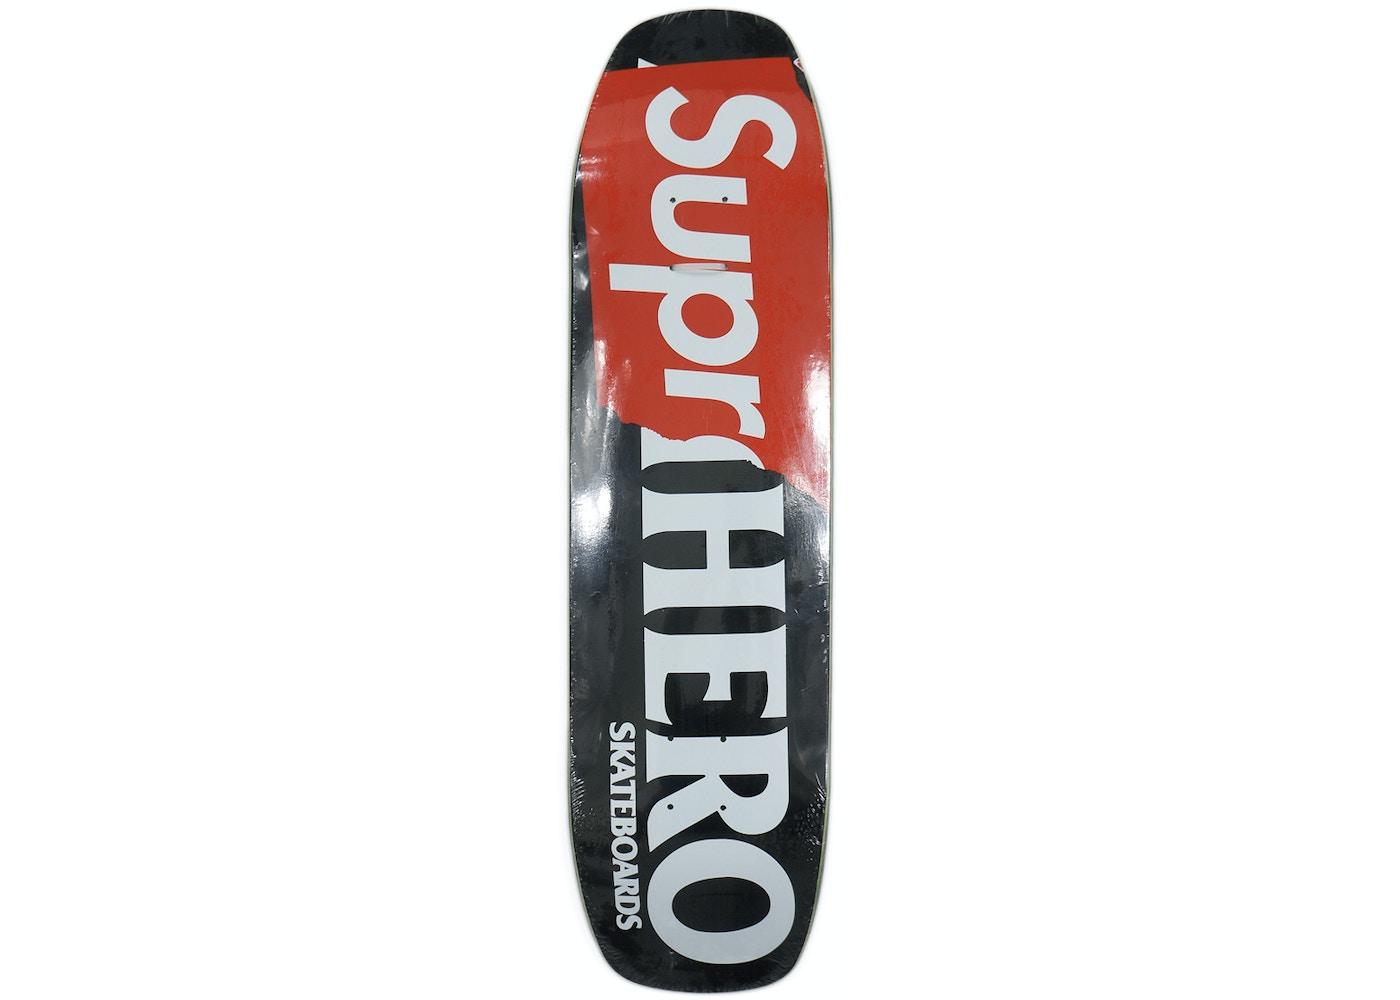 a32f444e7a Supreme Antihero Supr-Hero Skateboard Deck Black - SS14